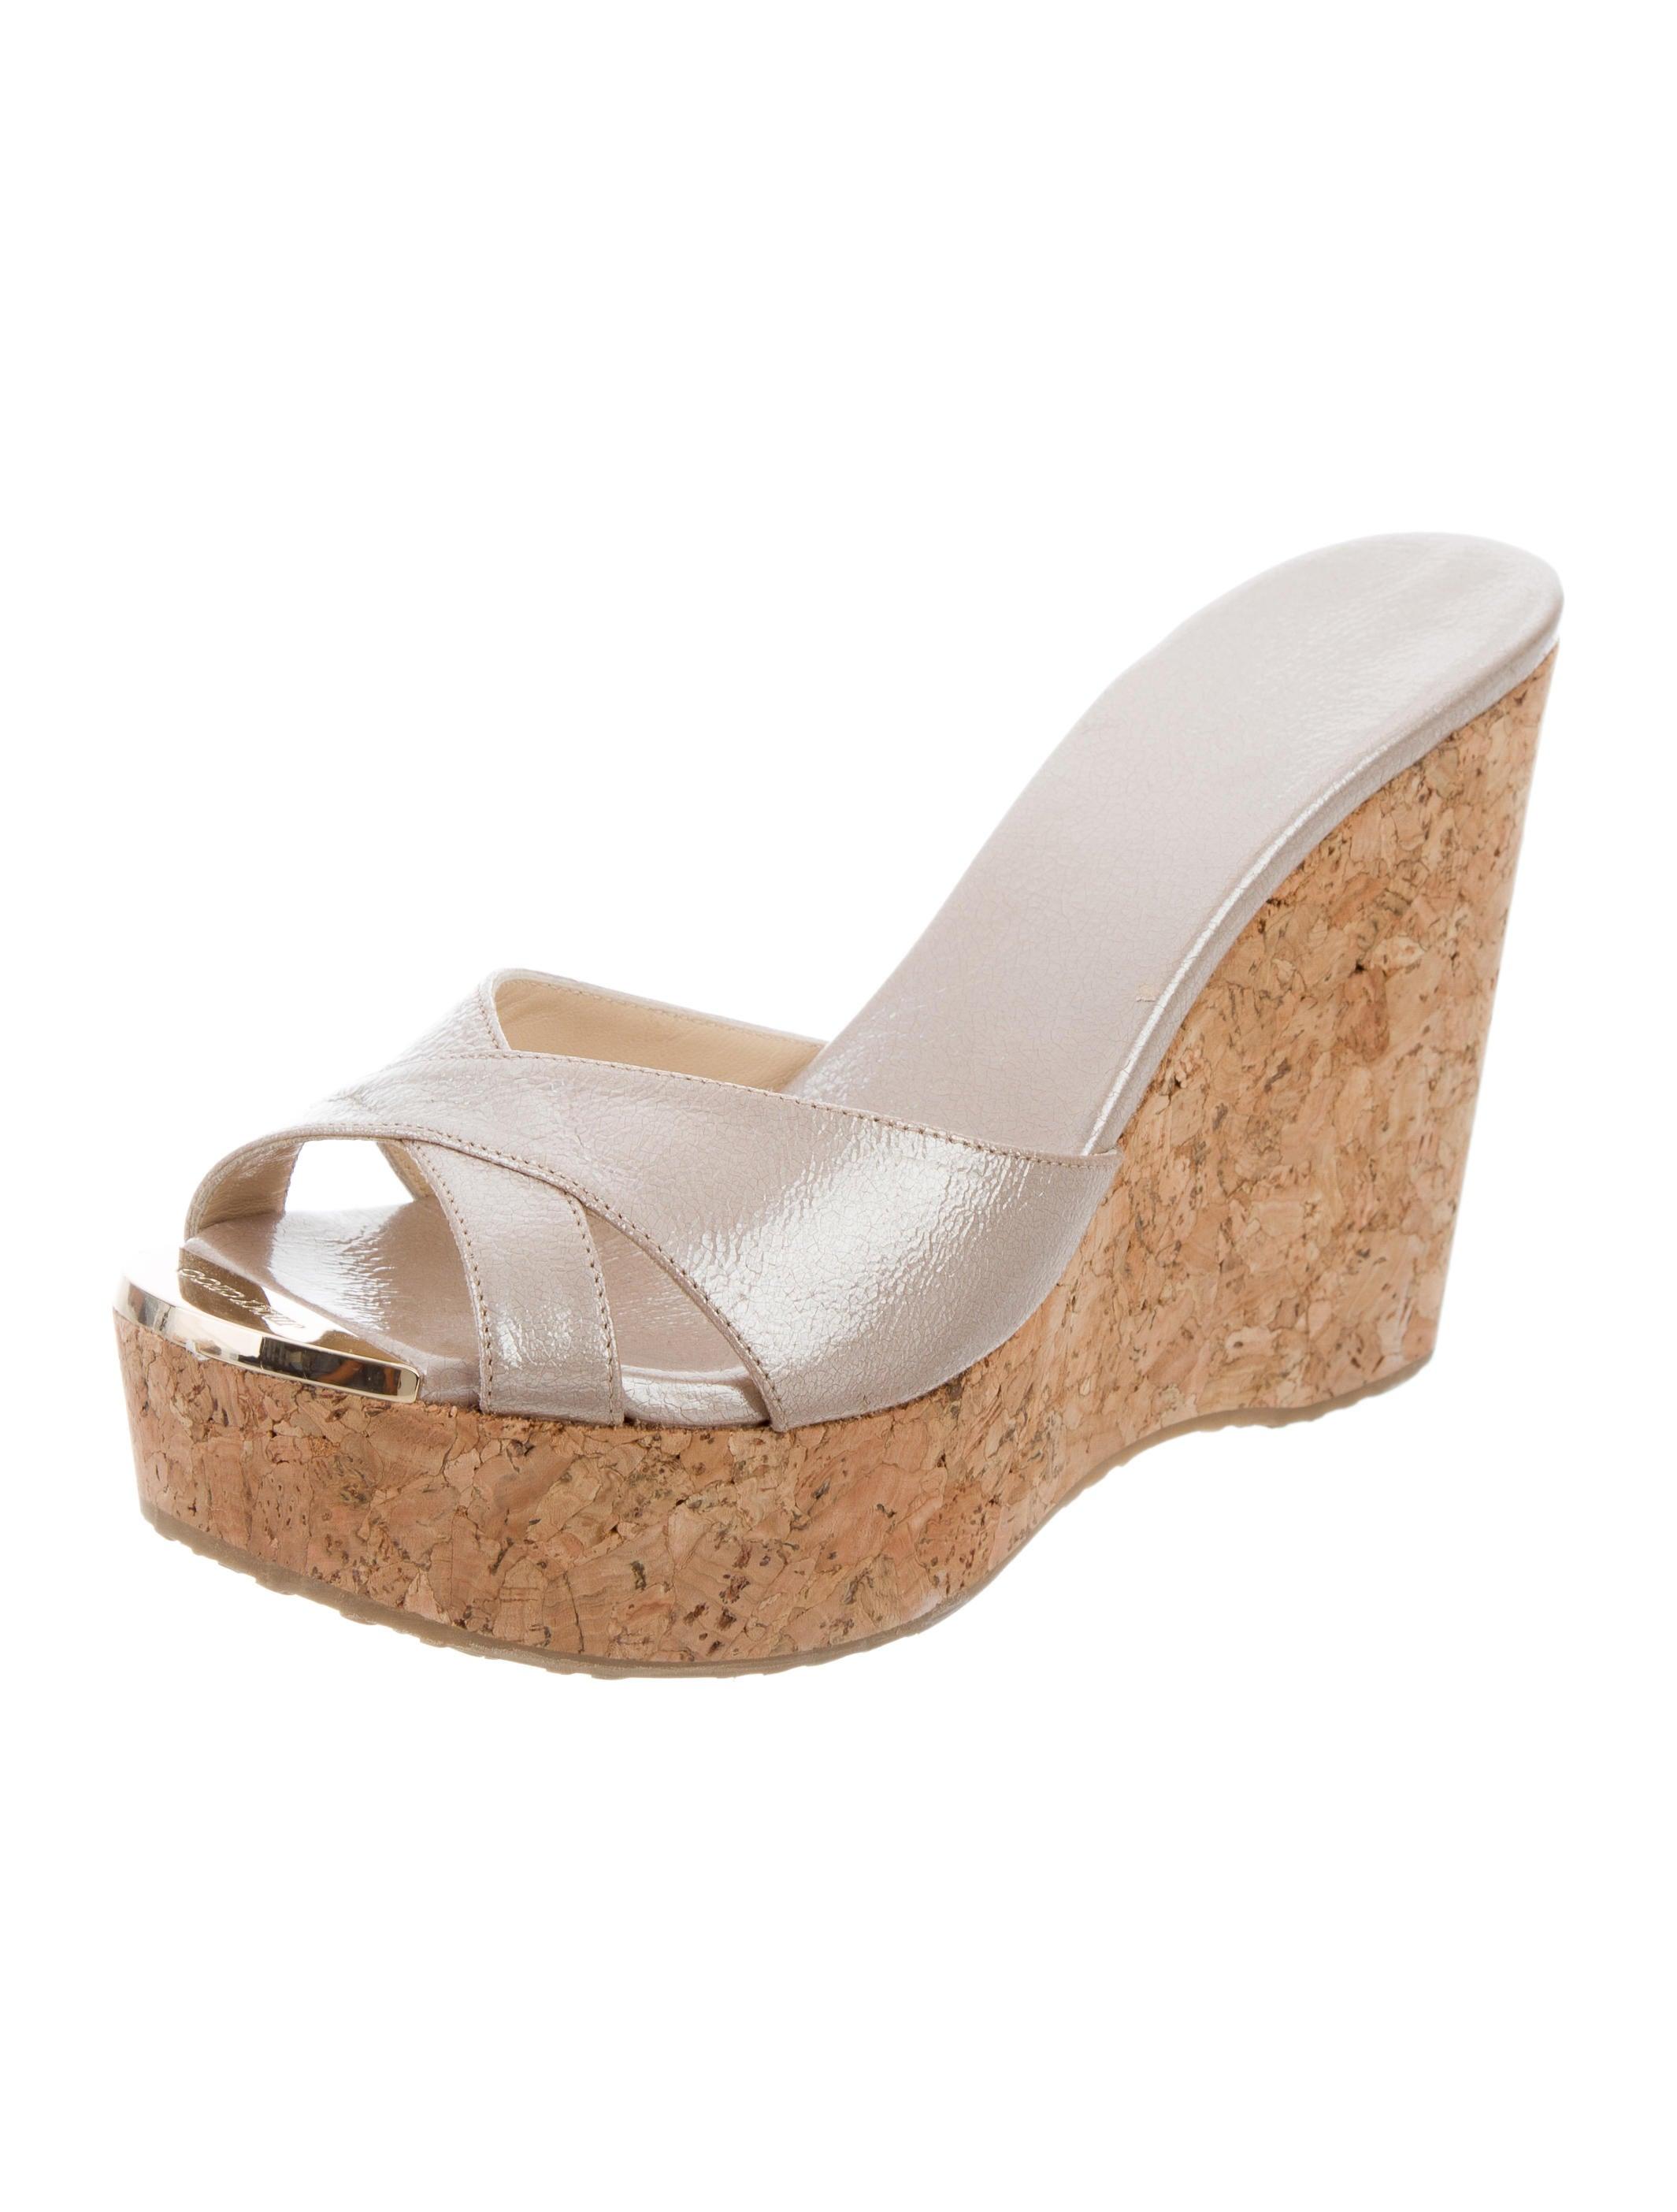 jimmy choo metallic platform wedges shoes jim70816